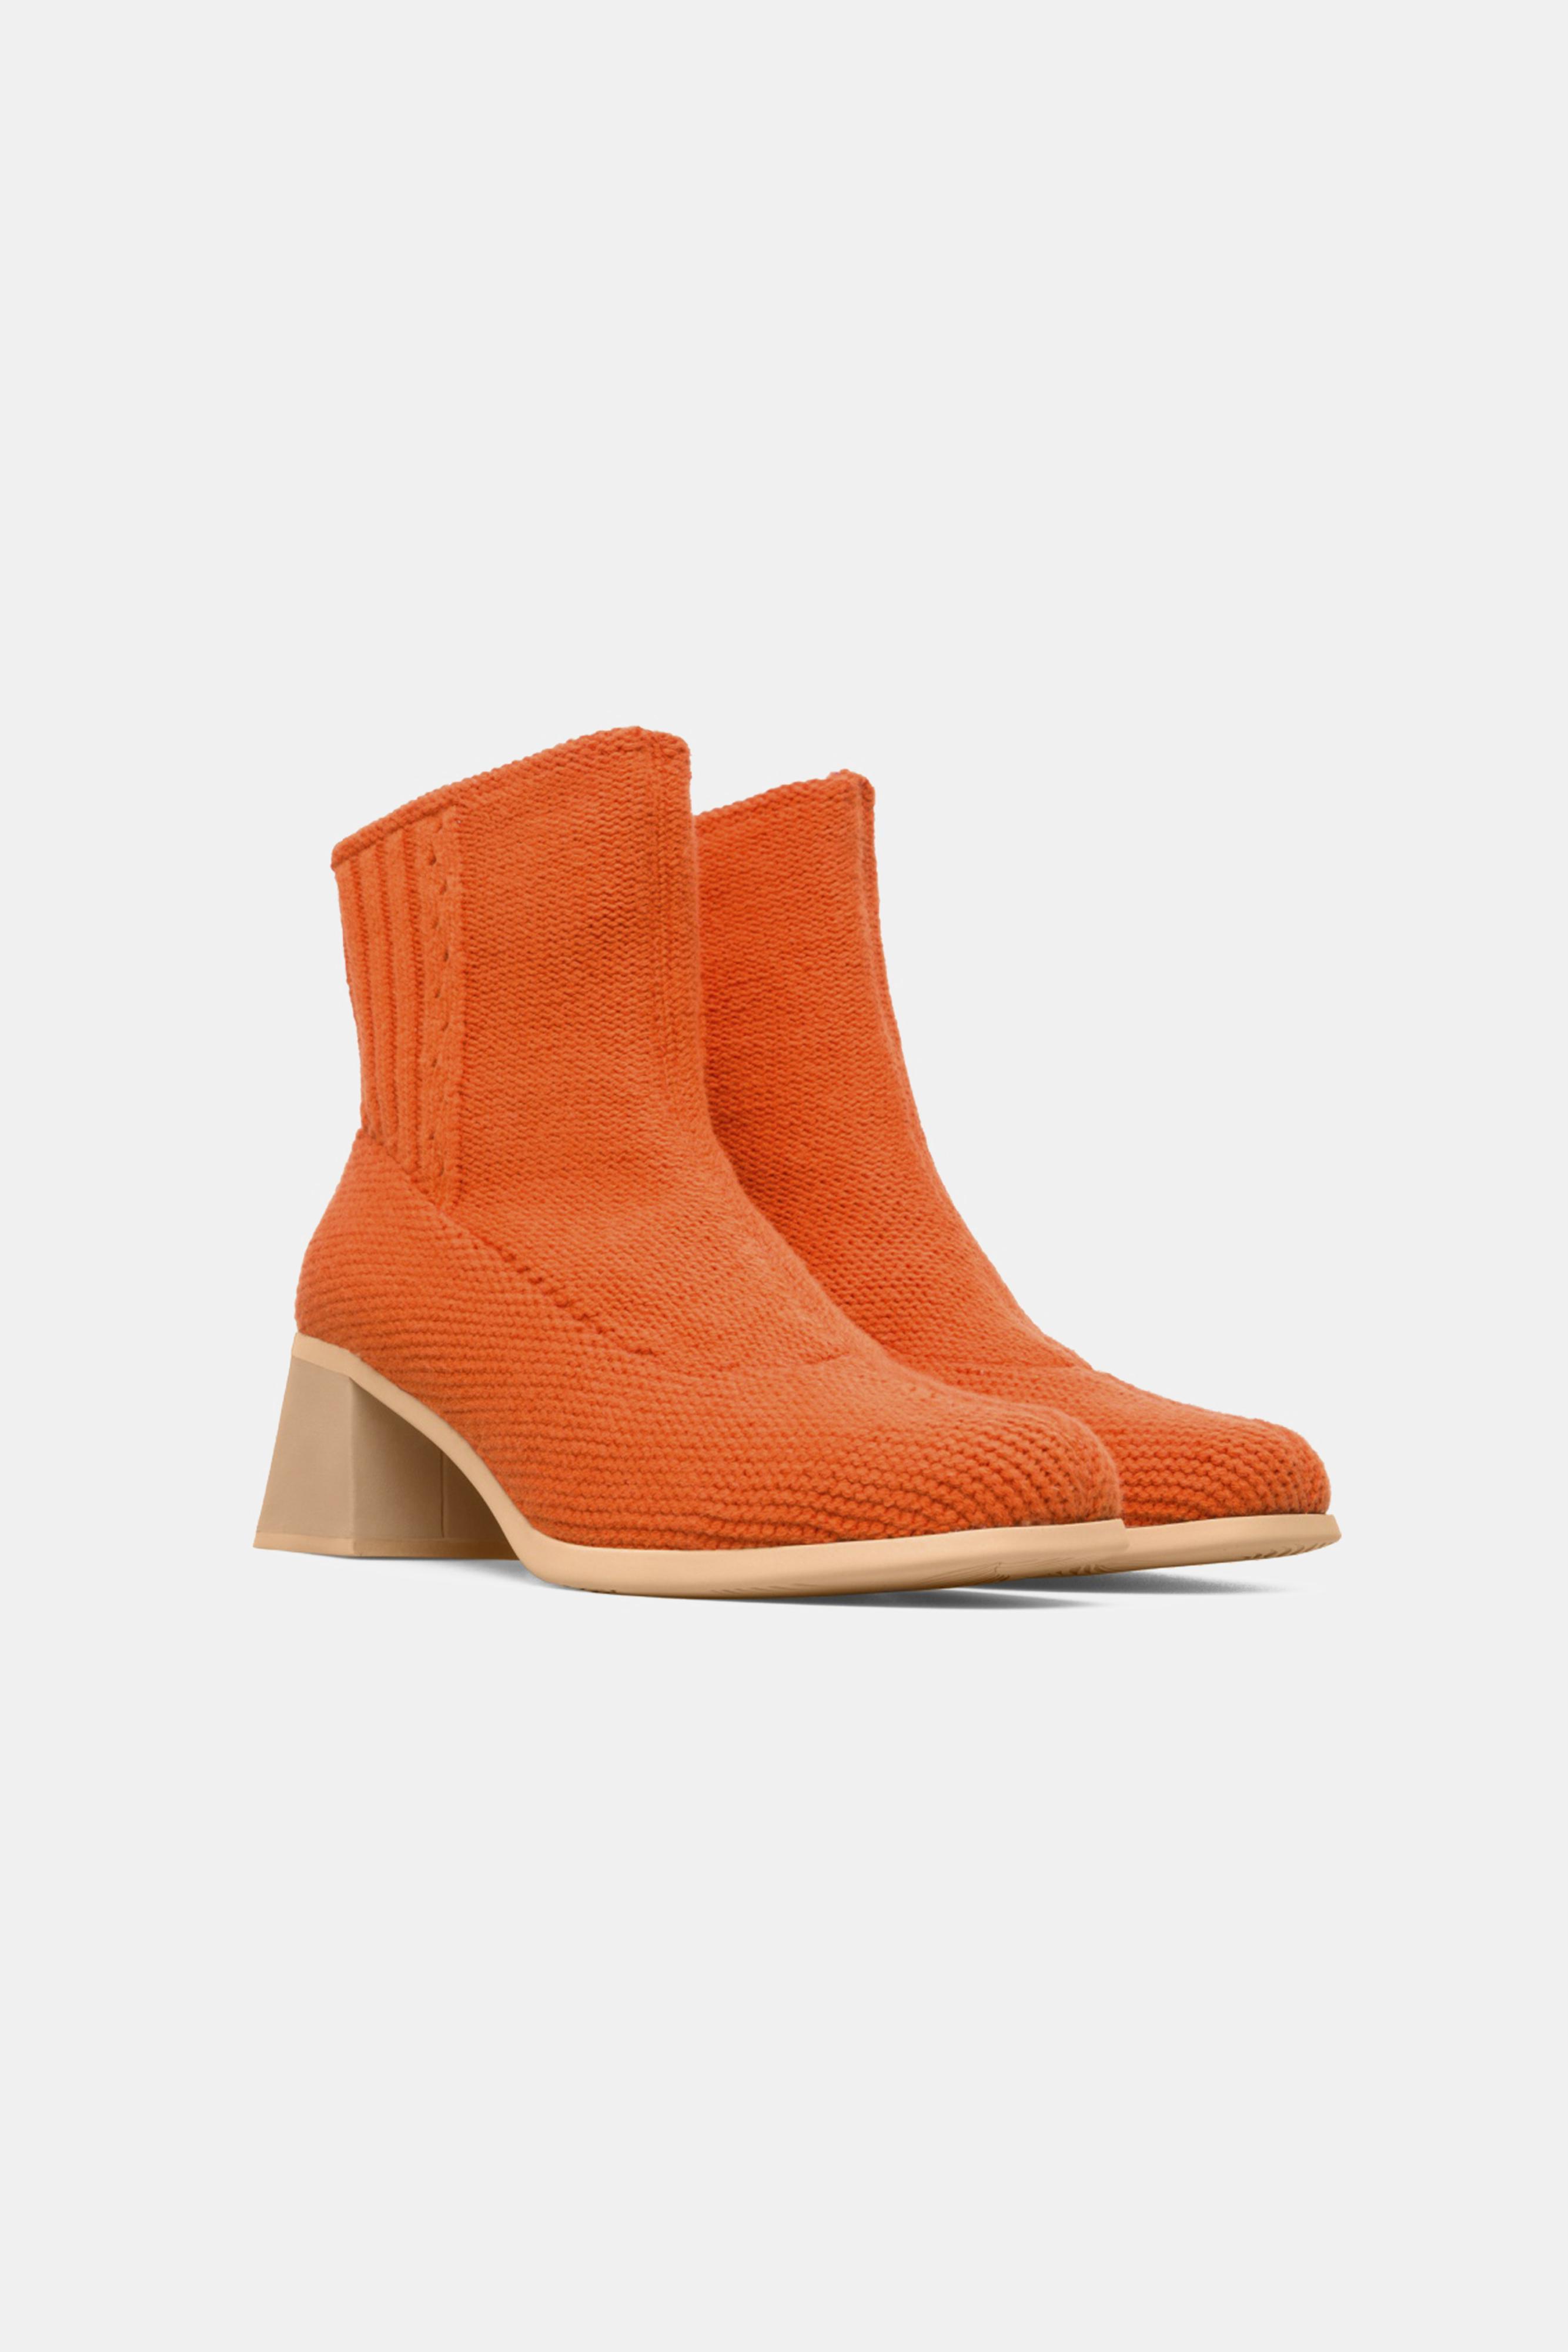 Eckhaus Latta Leather Orange Ankle